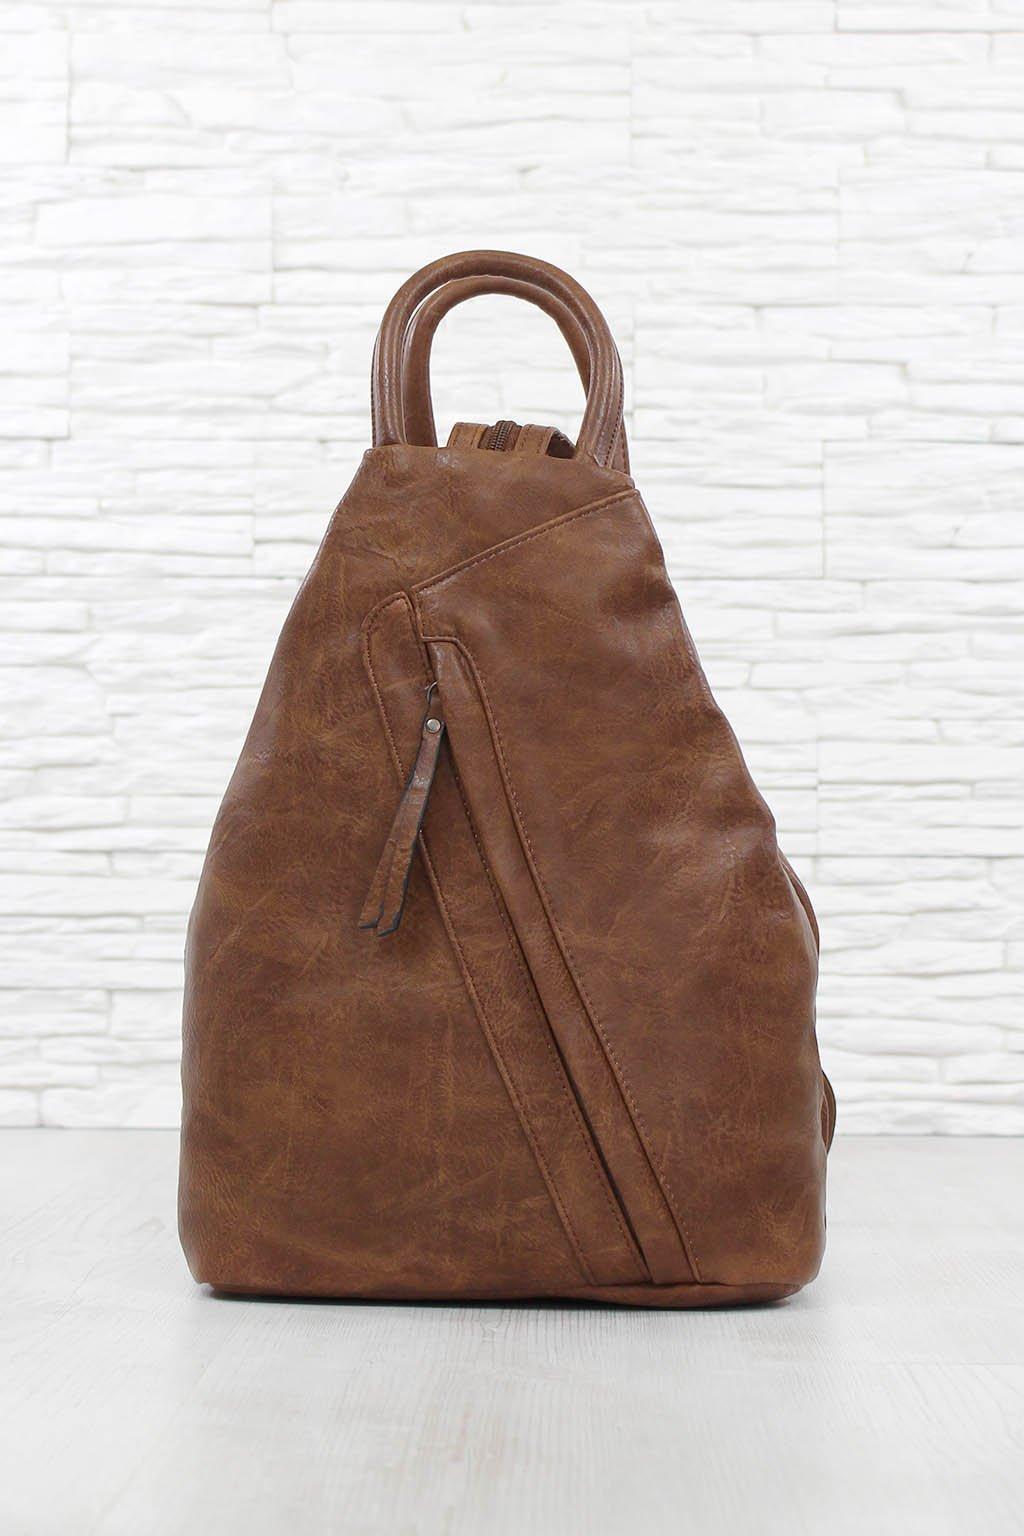 zxj781 brown1